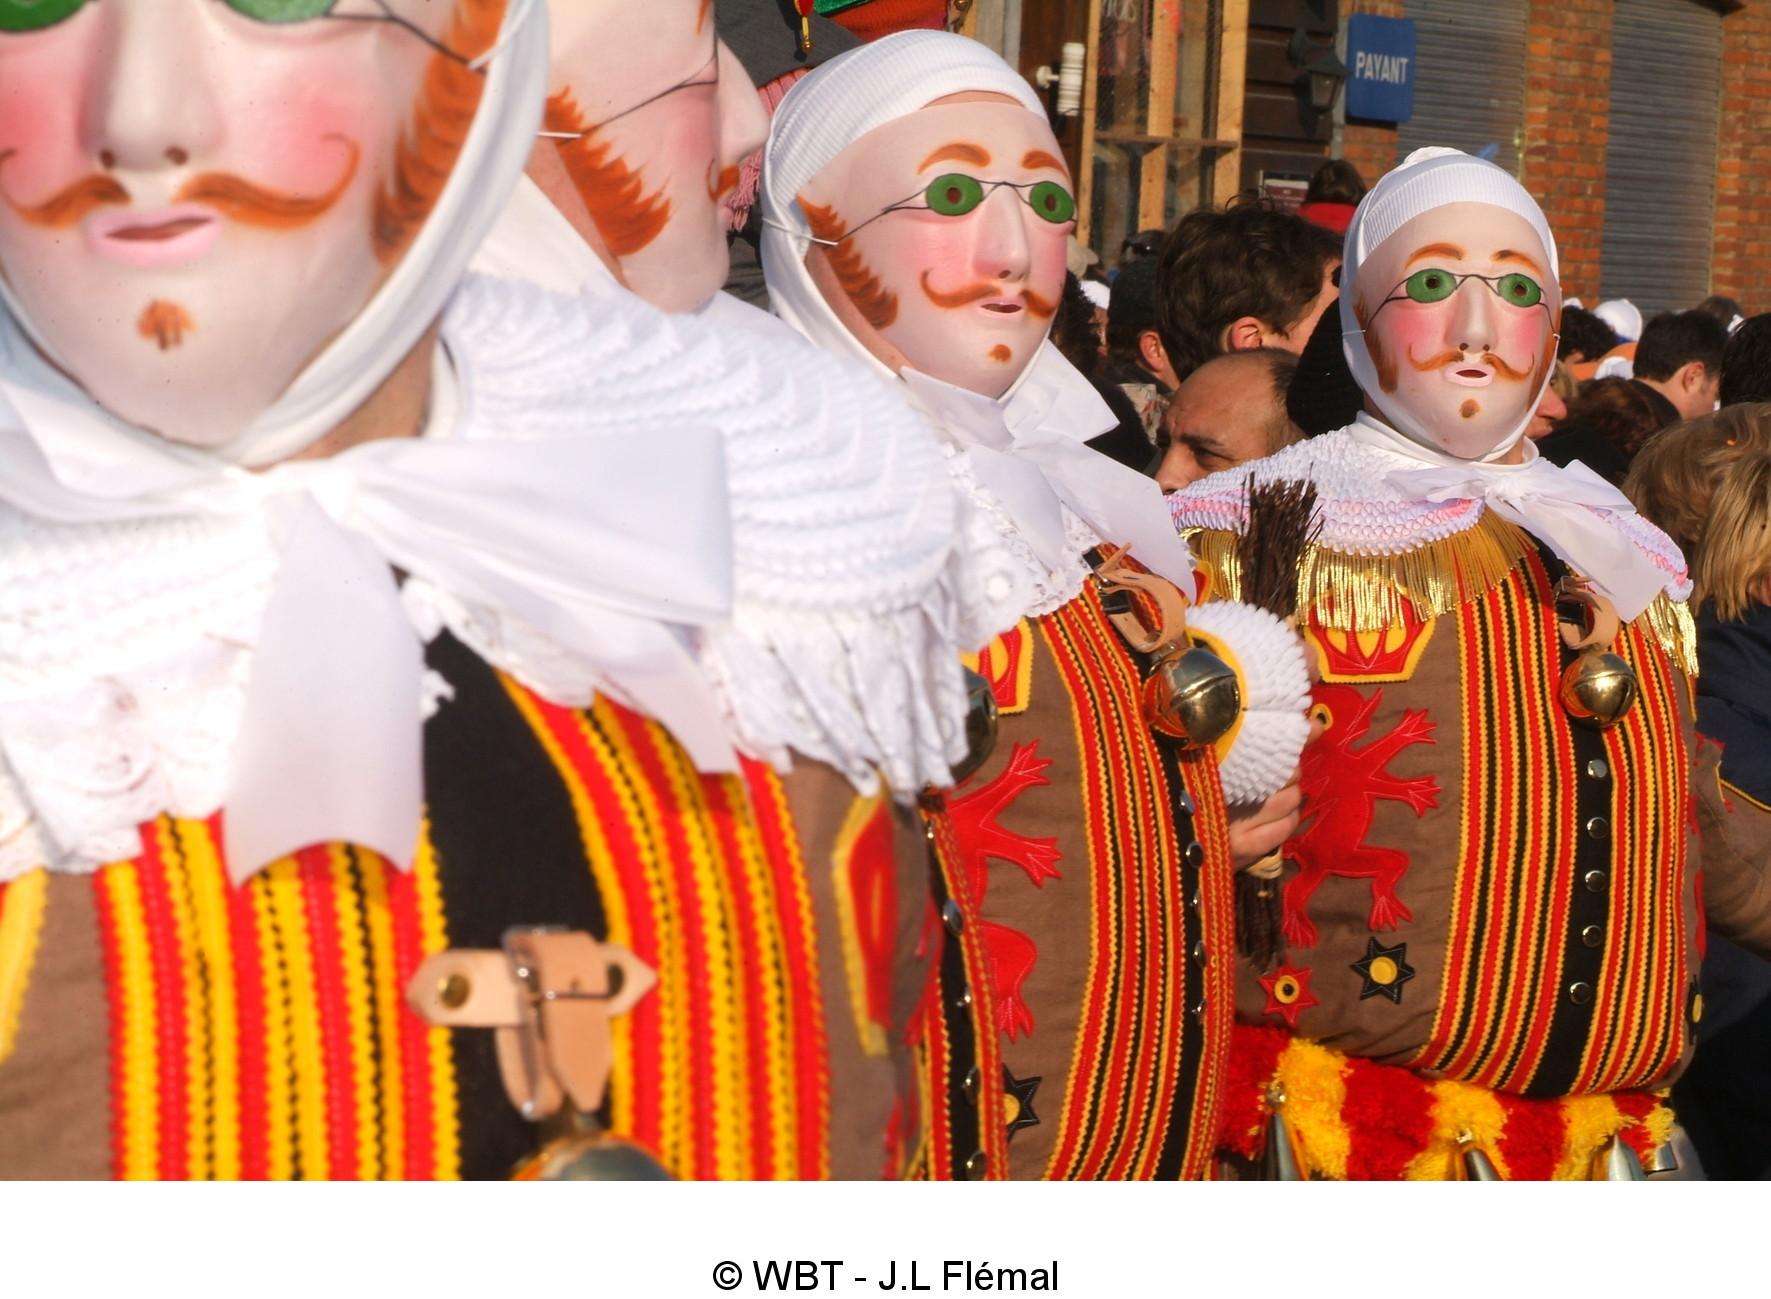 Carnaval de Binche - Les Gilles de Binche